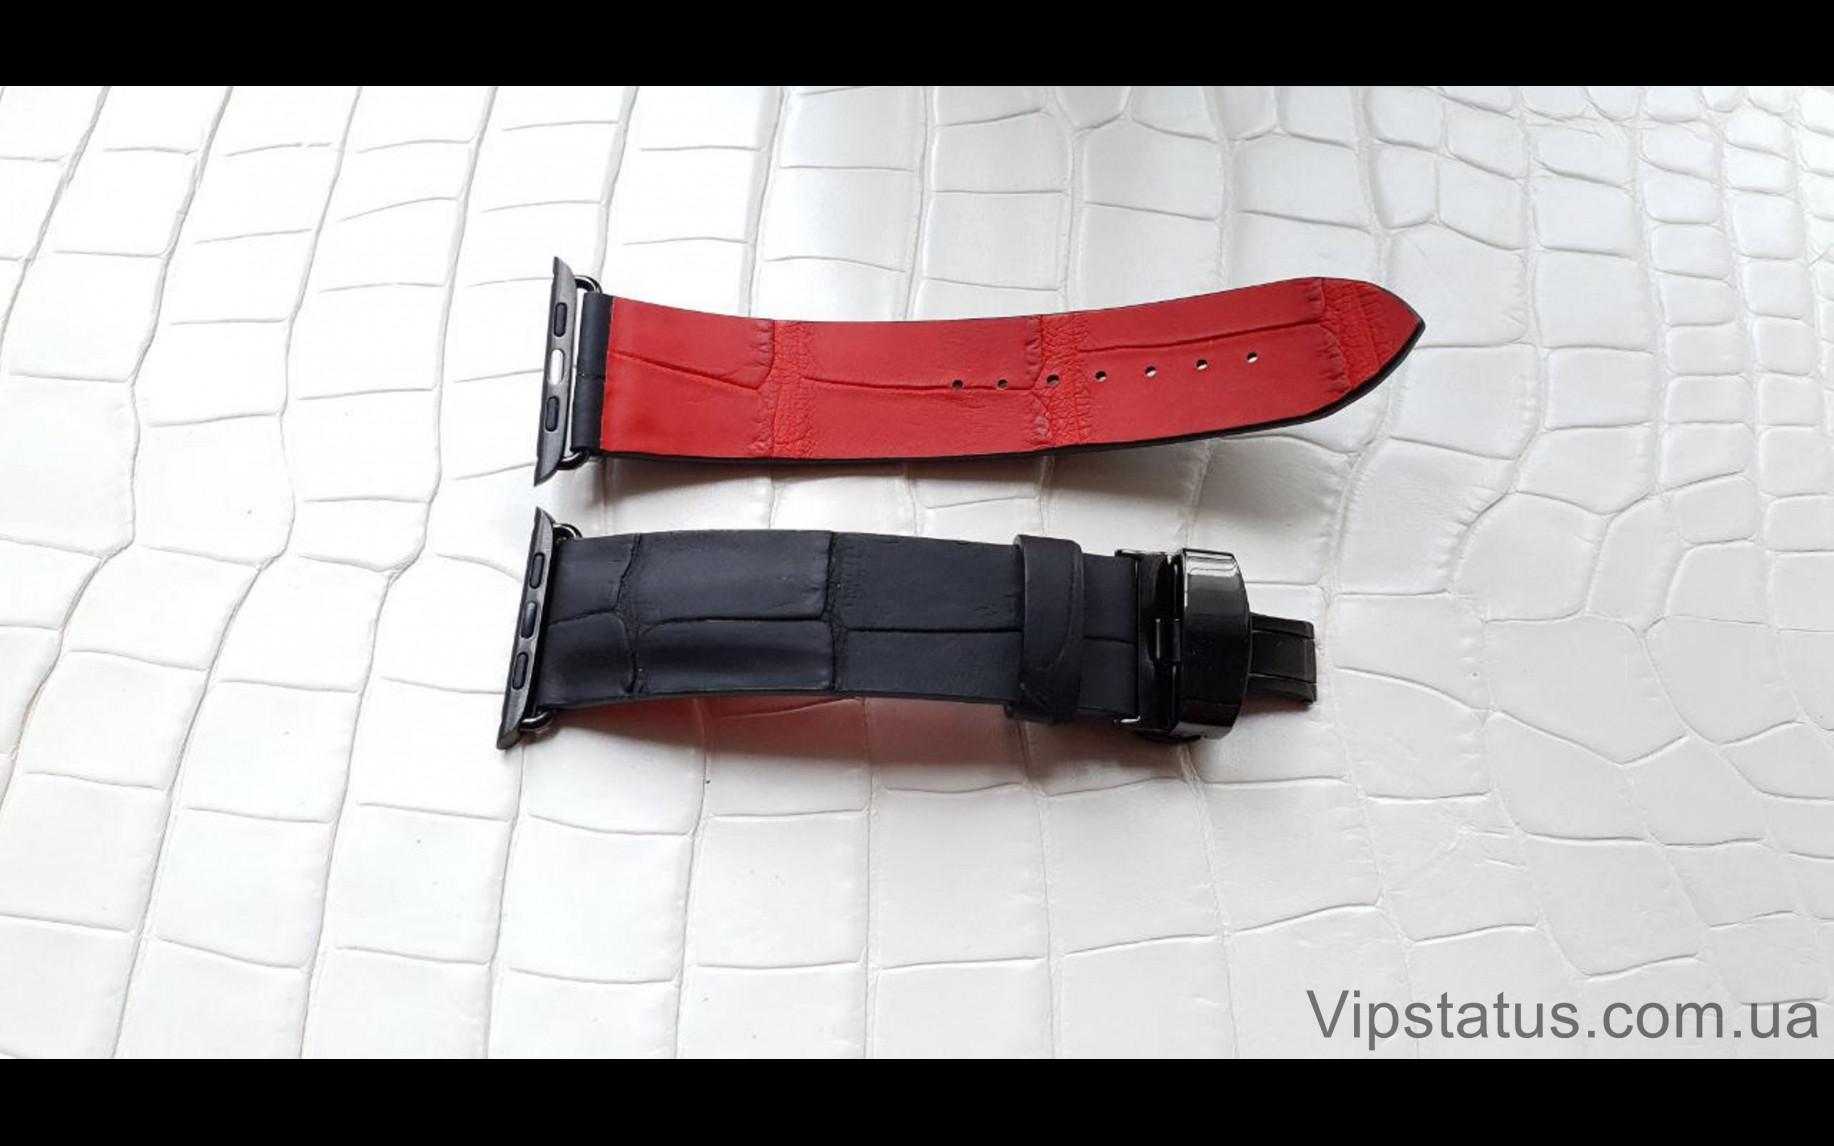 Elite Премиум ремешок для часов Montblanc кожа крокодила Premium Crocodile Strap for Montblanc watches image 2